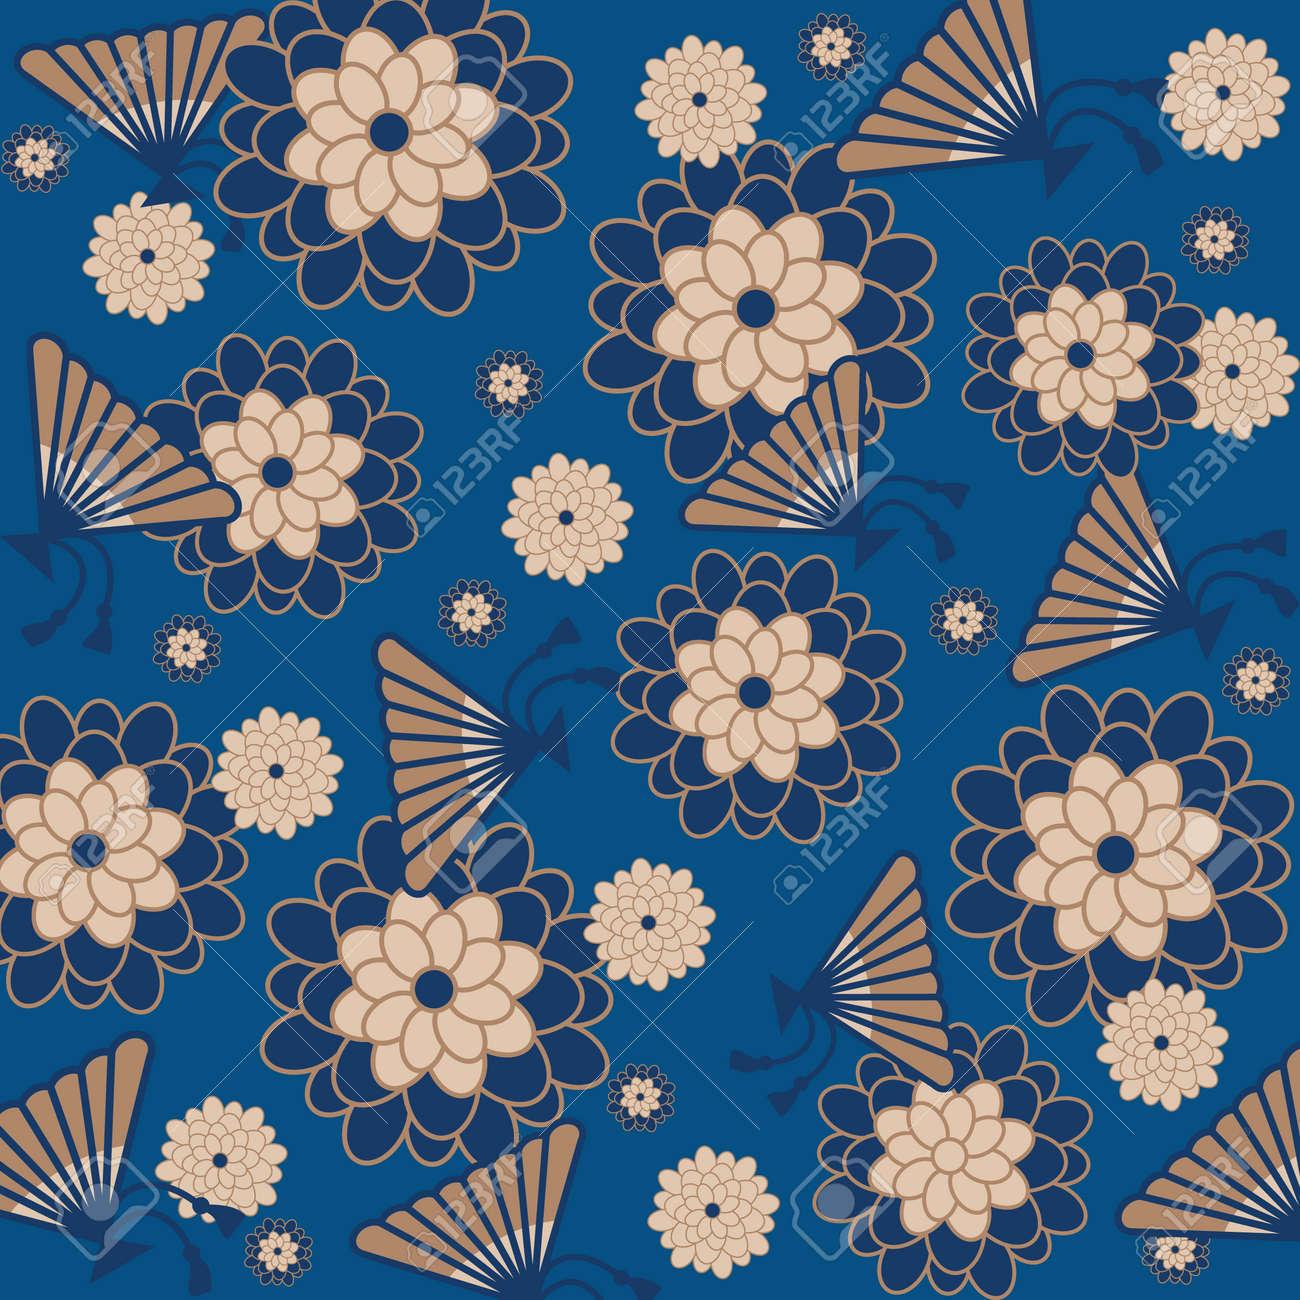 Japanese Floral Background Vector Illustration Royalty Free